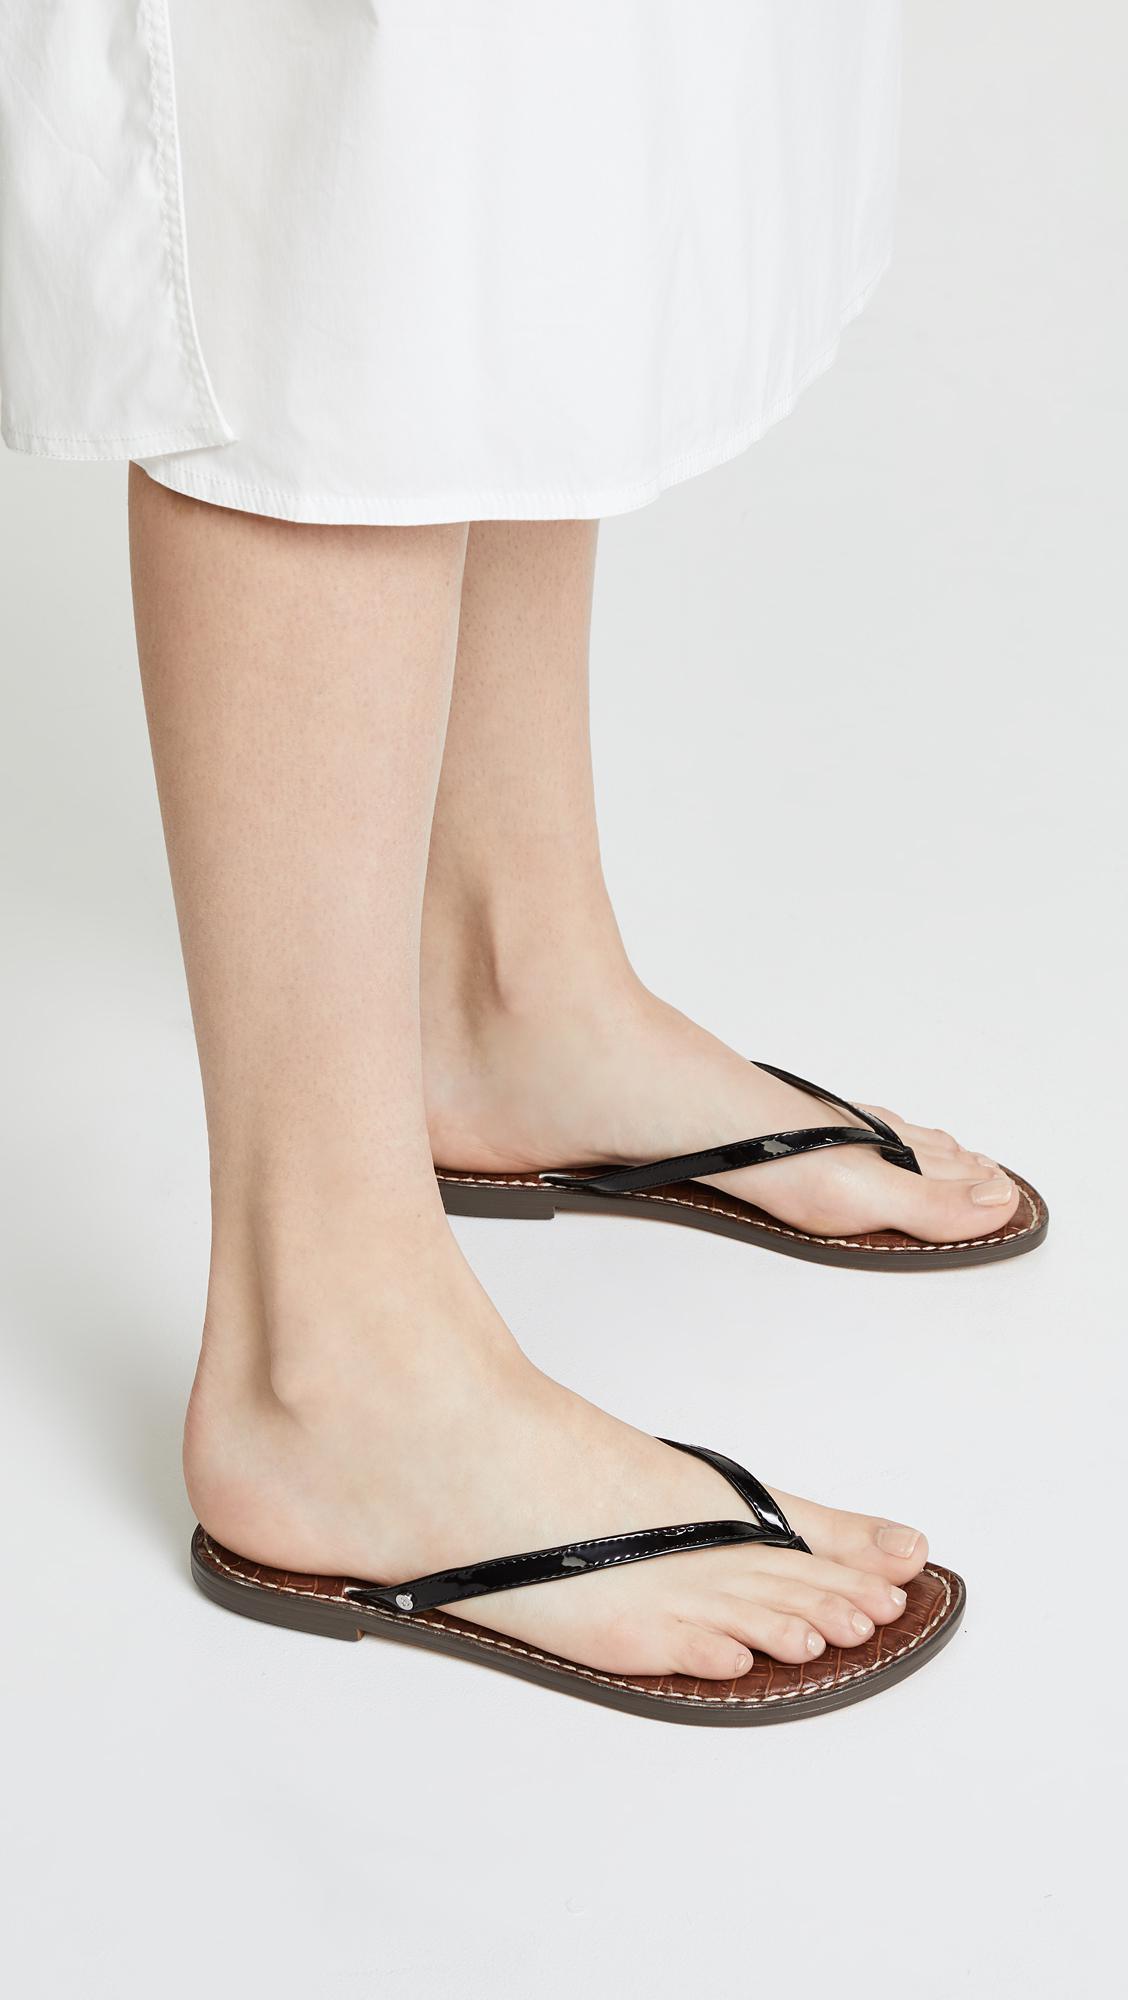 9e7edecbef1b9 Lyst - Sam Edelman Gracie Thong Sandals in Black